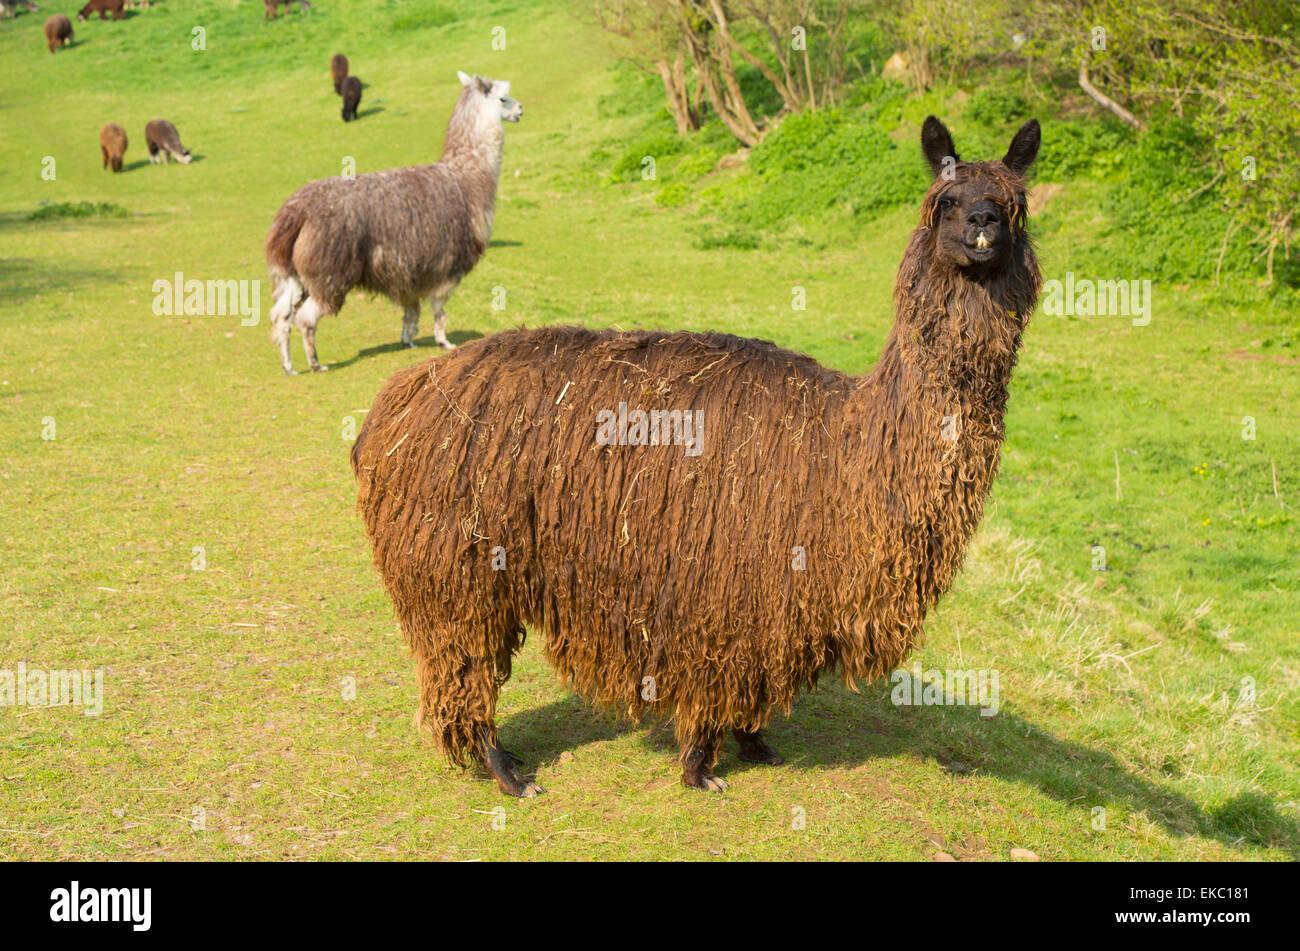 Hairy Alpaca brown shaggy coat South American camelid resembles small llama - Stock Image